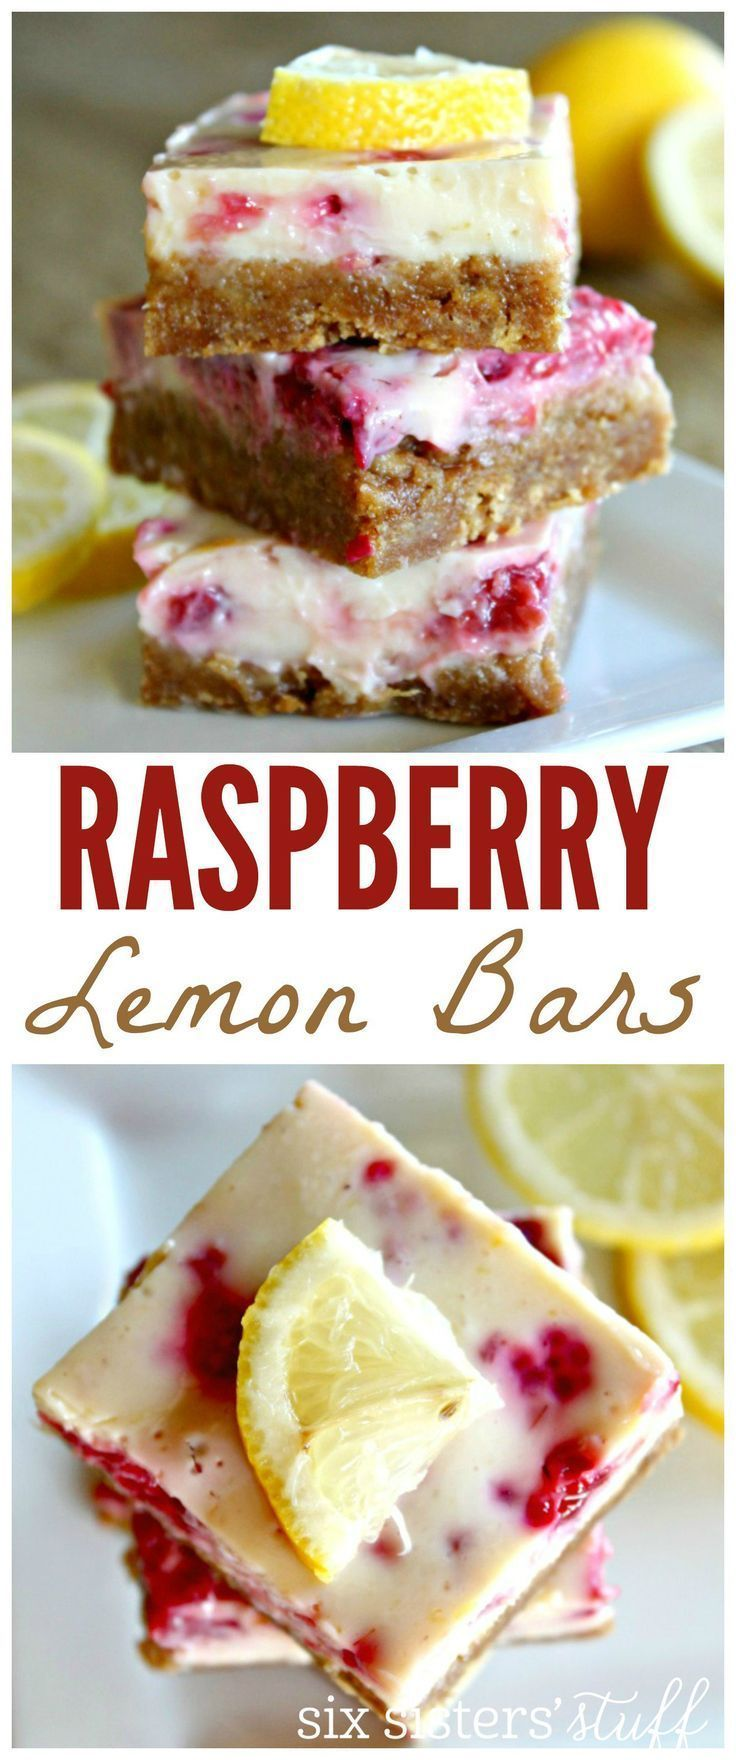 Raspberry Lemon Bars from Six Sisters Stuff | Best Dessert Recipes | Bars and Brownies Ideas | Potluck Food | Spring Food Ideas | Easter Dessert